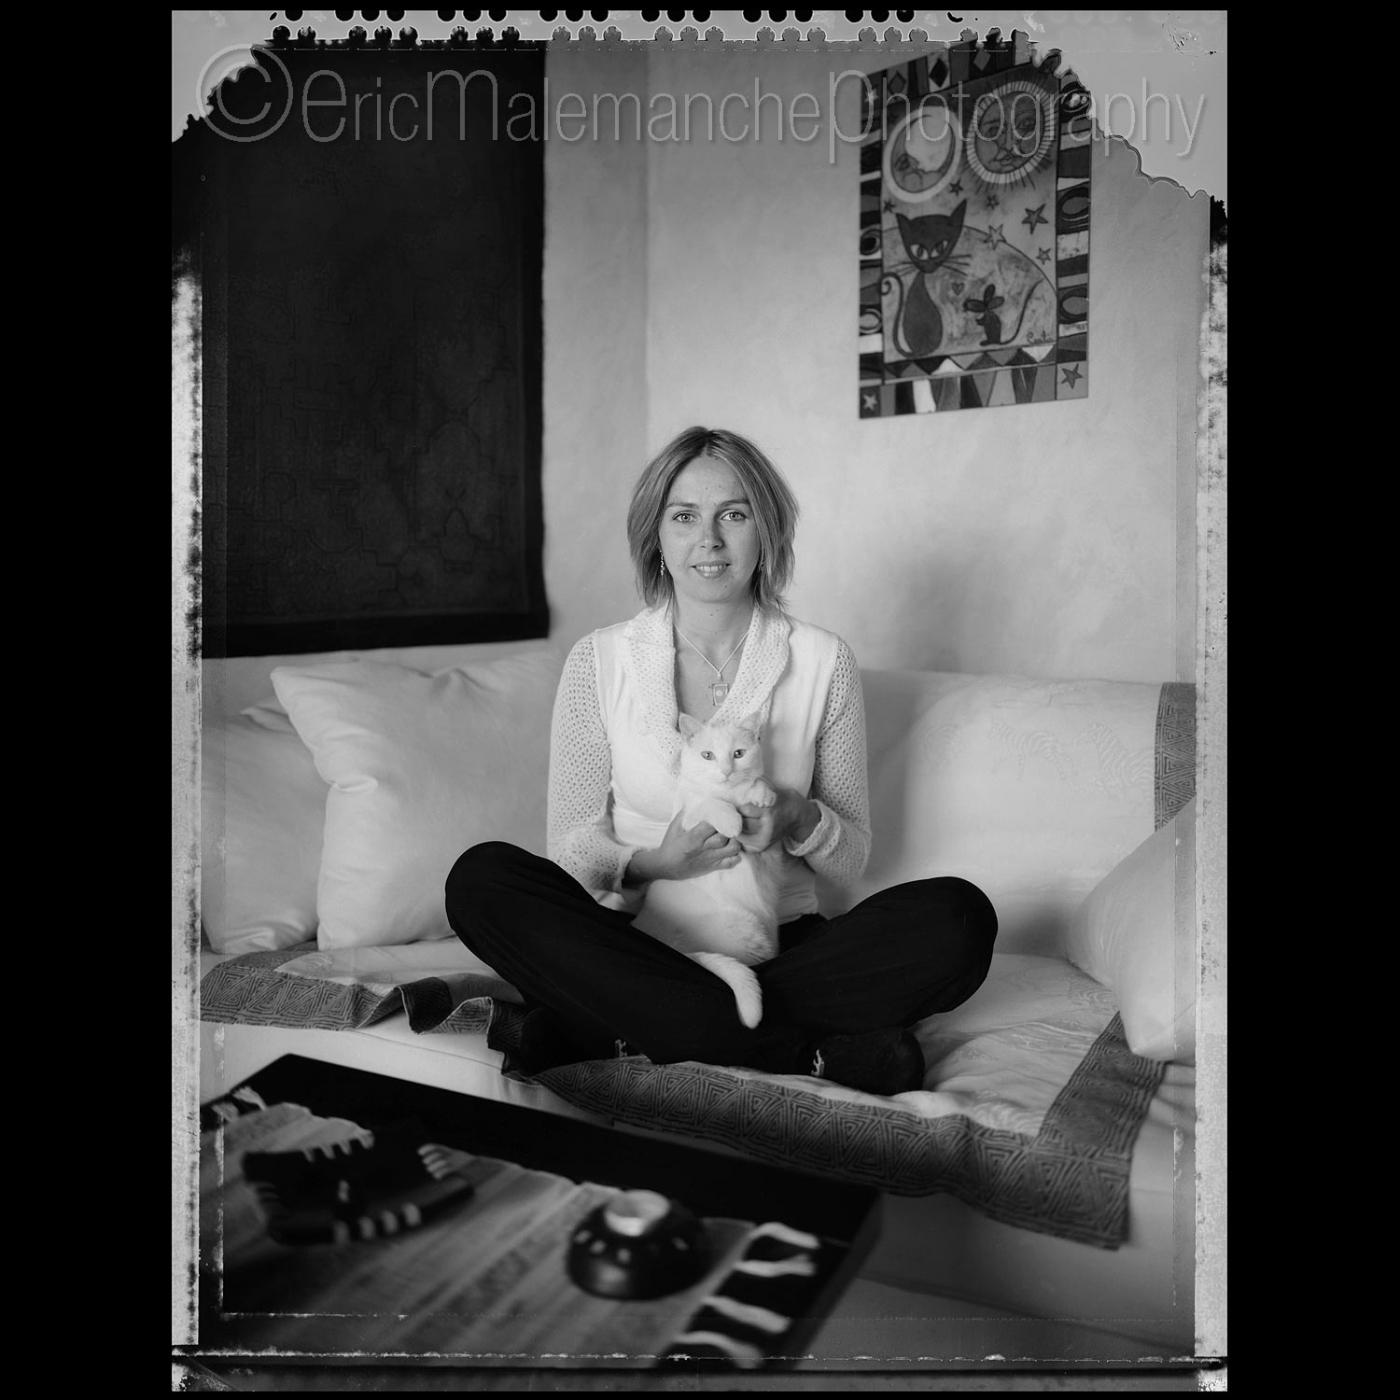 https://www.ericmalemanche.com/imagess/topics/andar/liste/Andar-Ingrid.jpg